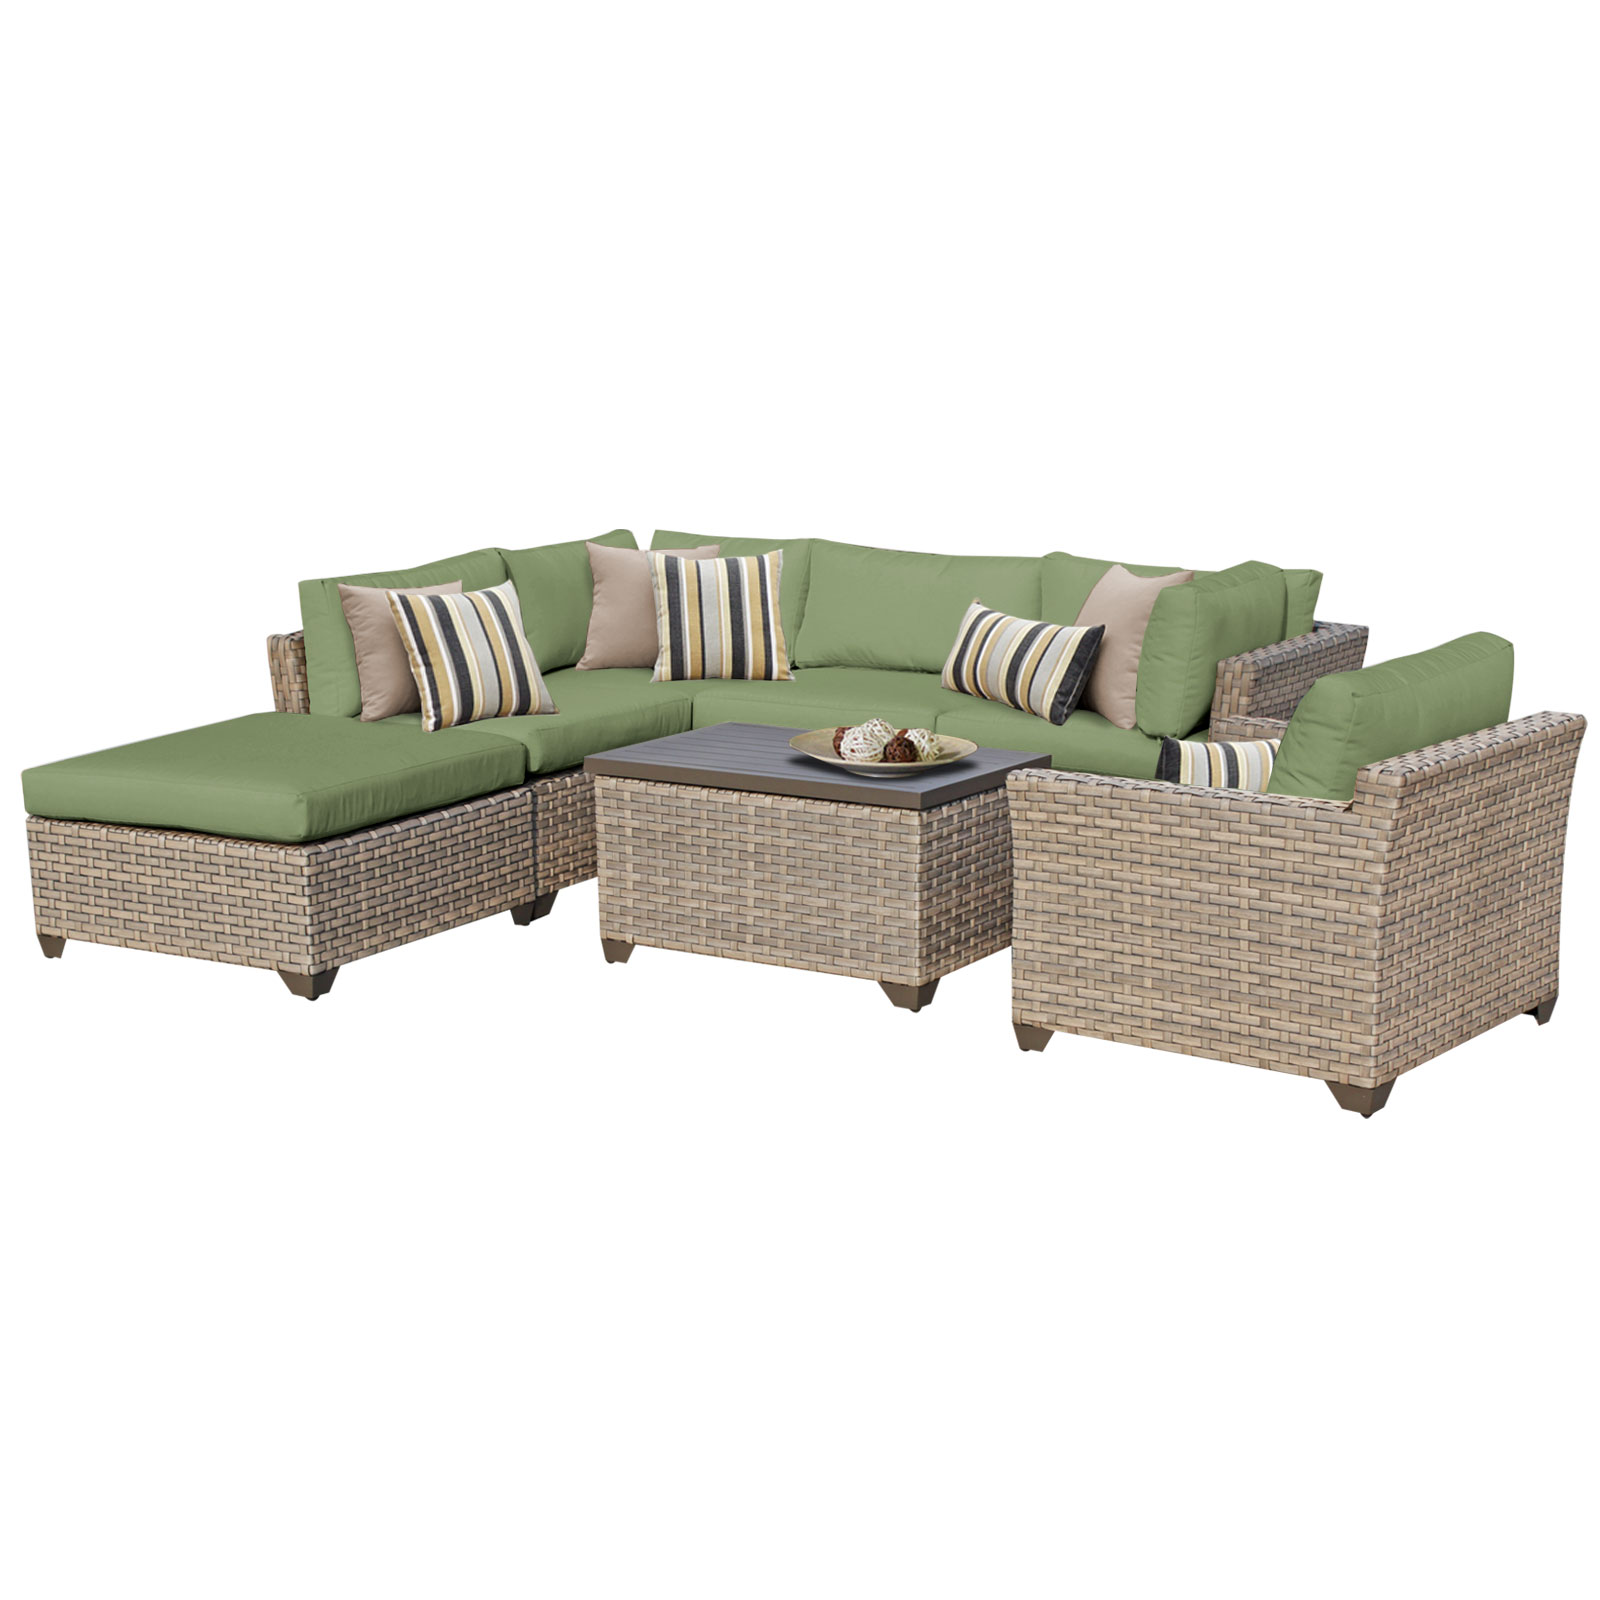 Hampton 7 Piece Outdoor Wicker Patio Furniture Set 07d by TK Classics